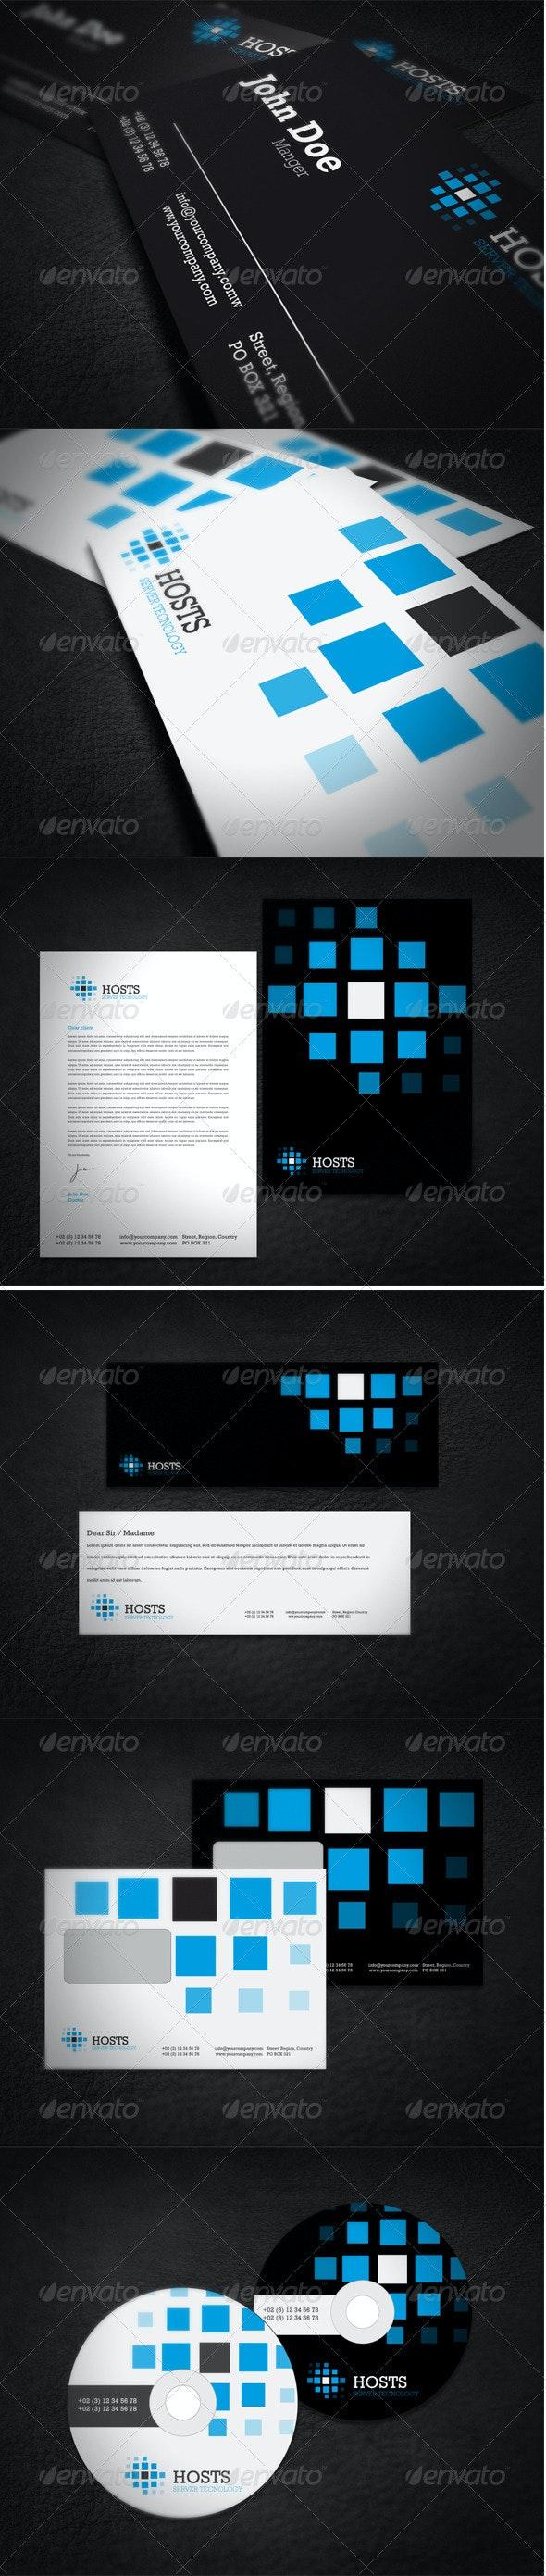 Hosting Company Corporate Identity - Stationery Print Templates